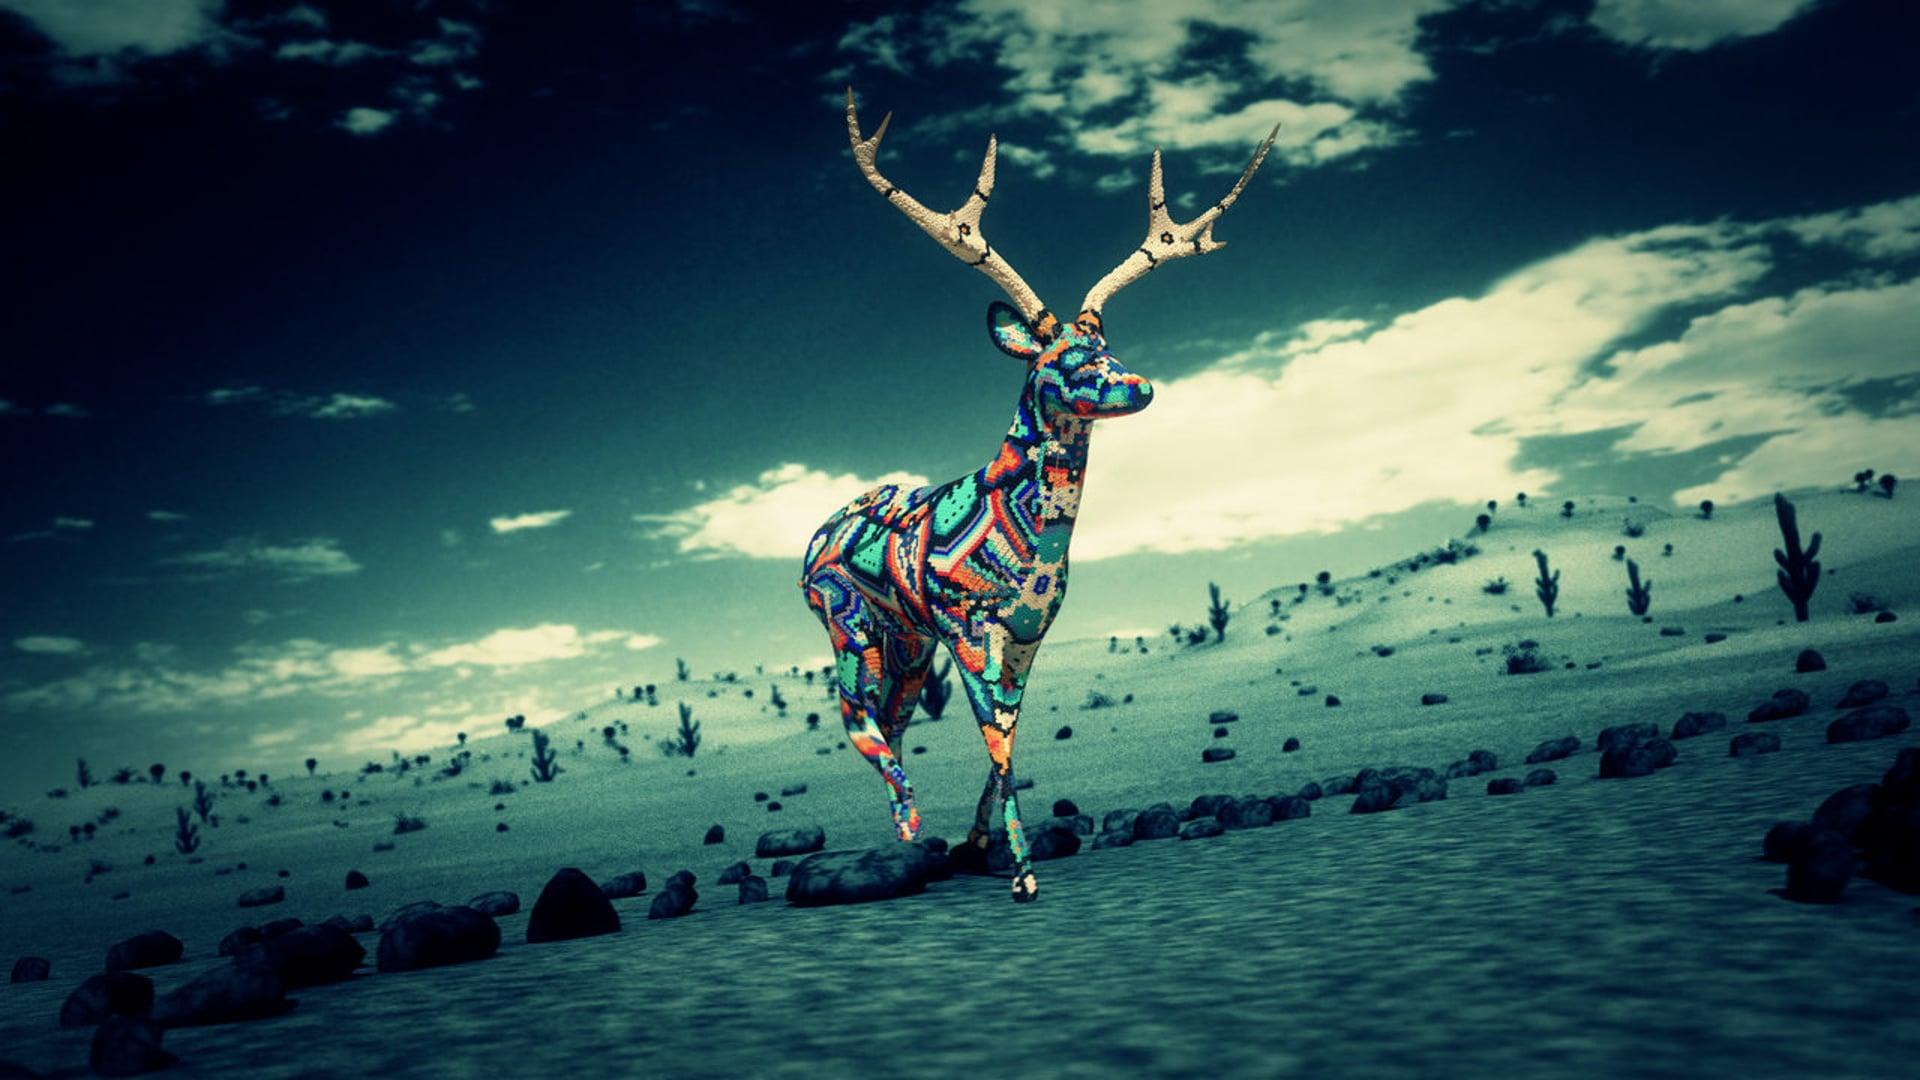 KAUYUMARI The Blue Deer (Subtitles Option)